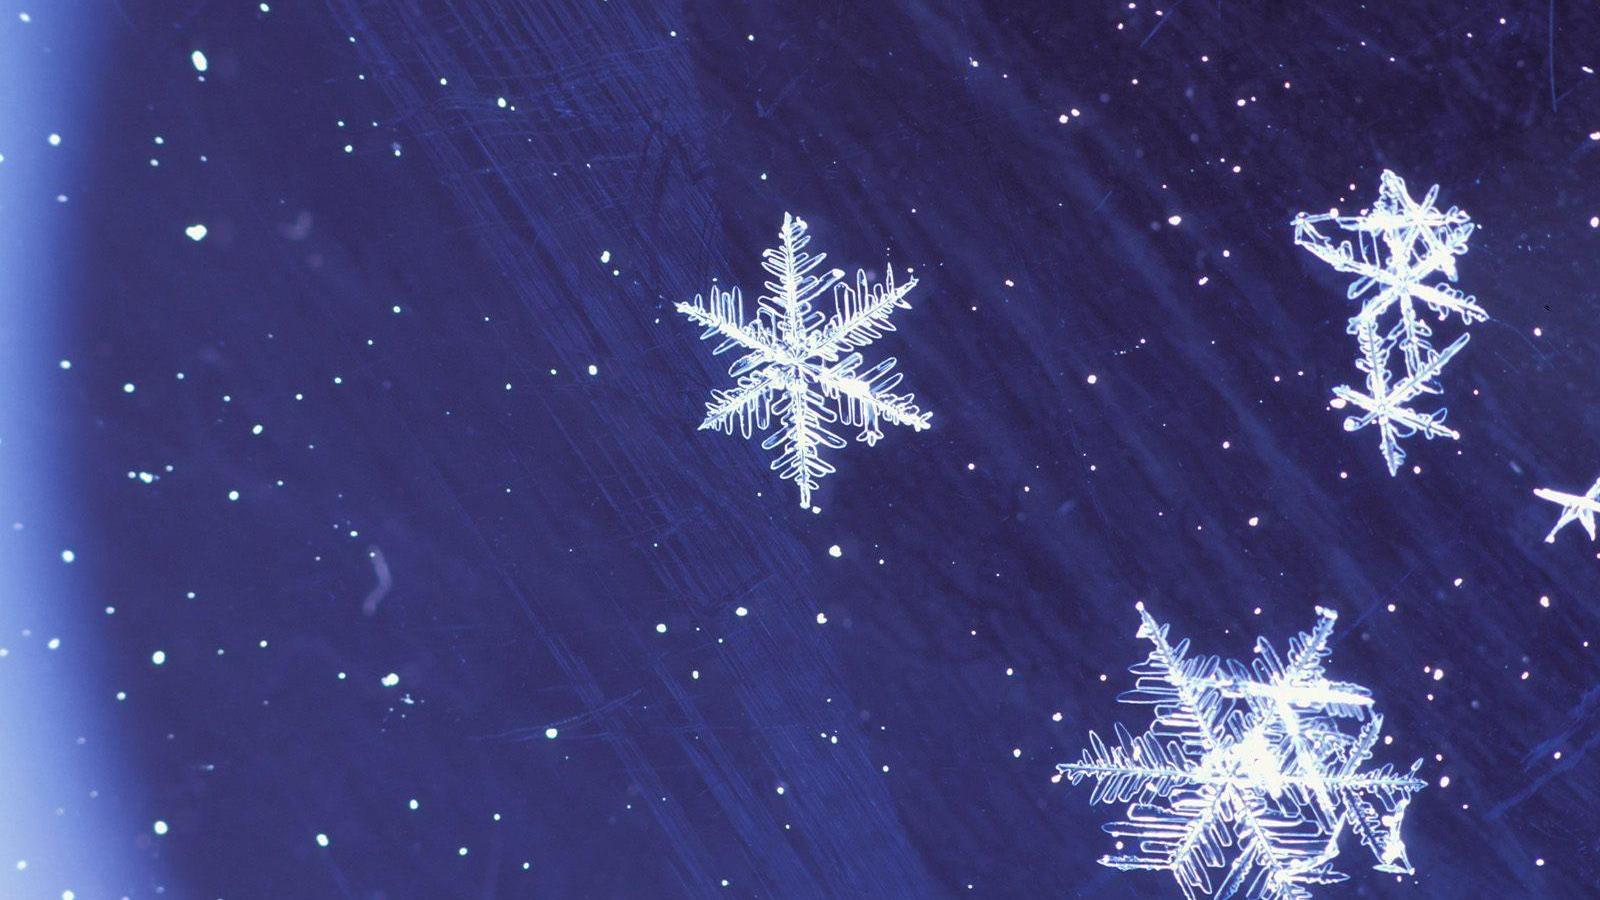 Free Download Animated Christmas Wallpaper Christmas Wallpaper For